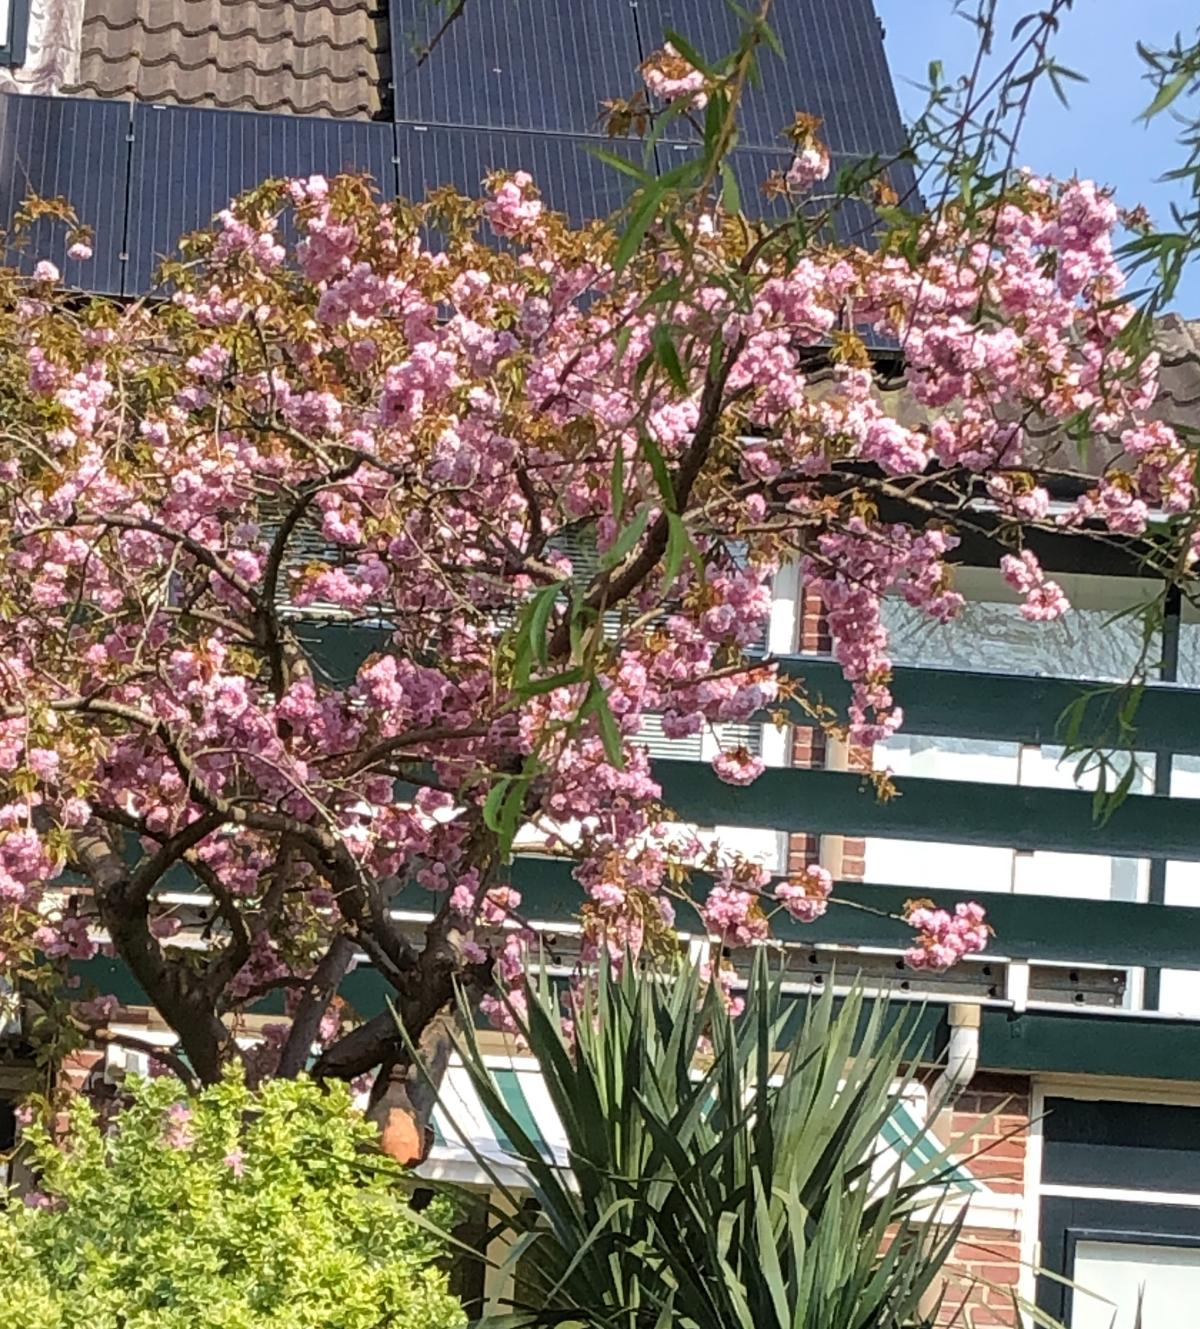 A beautiful Japanese Cherry Tree blooming in a neighborhood garden